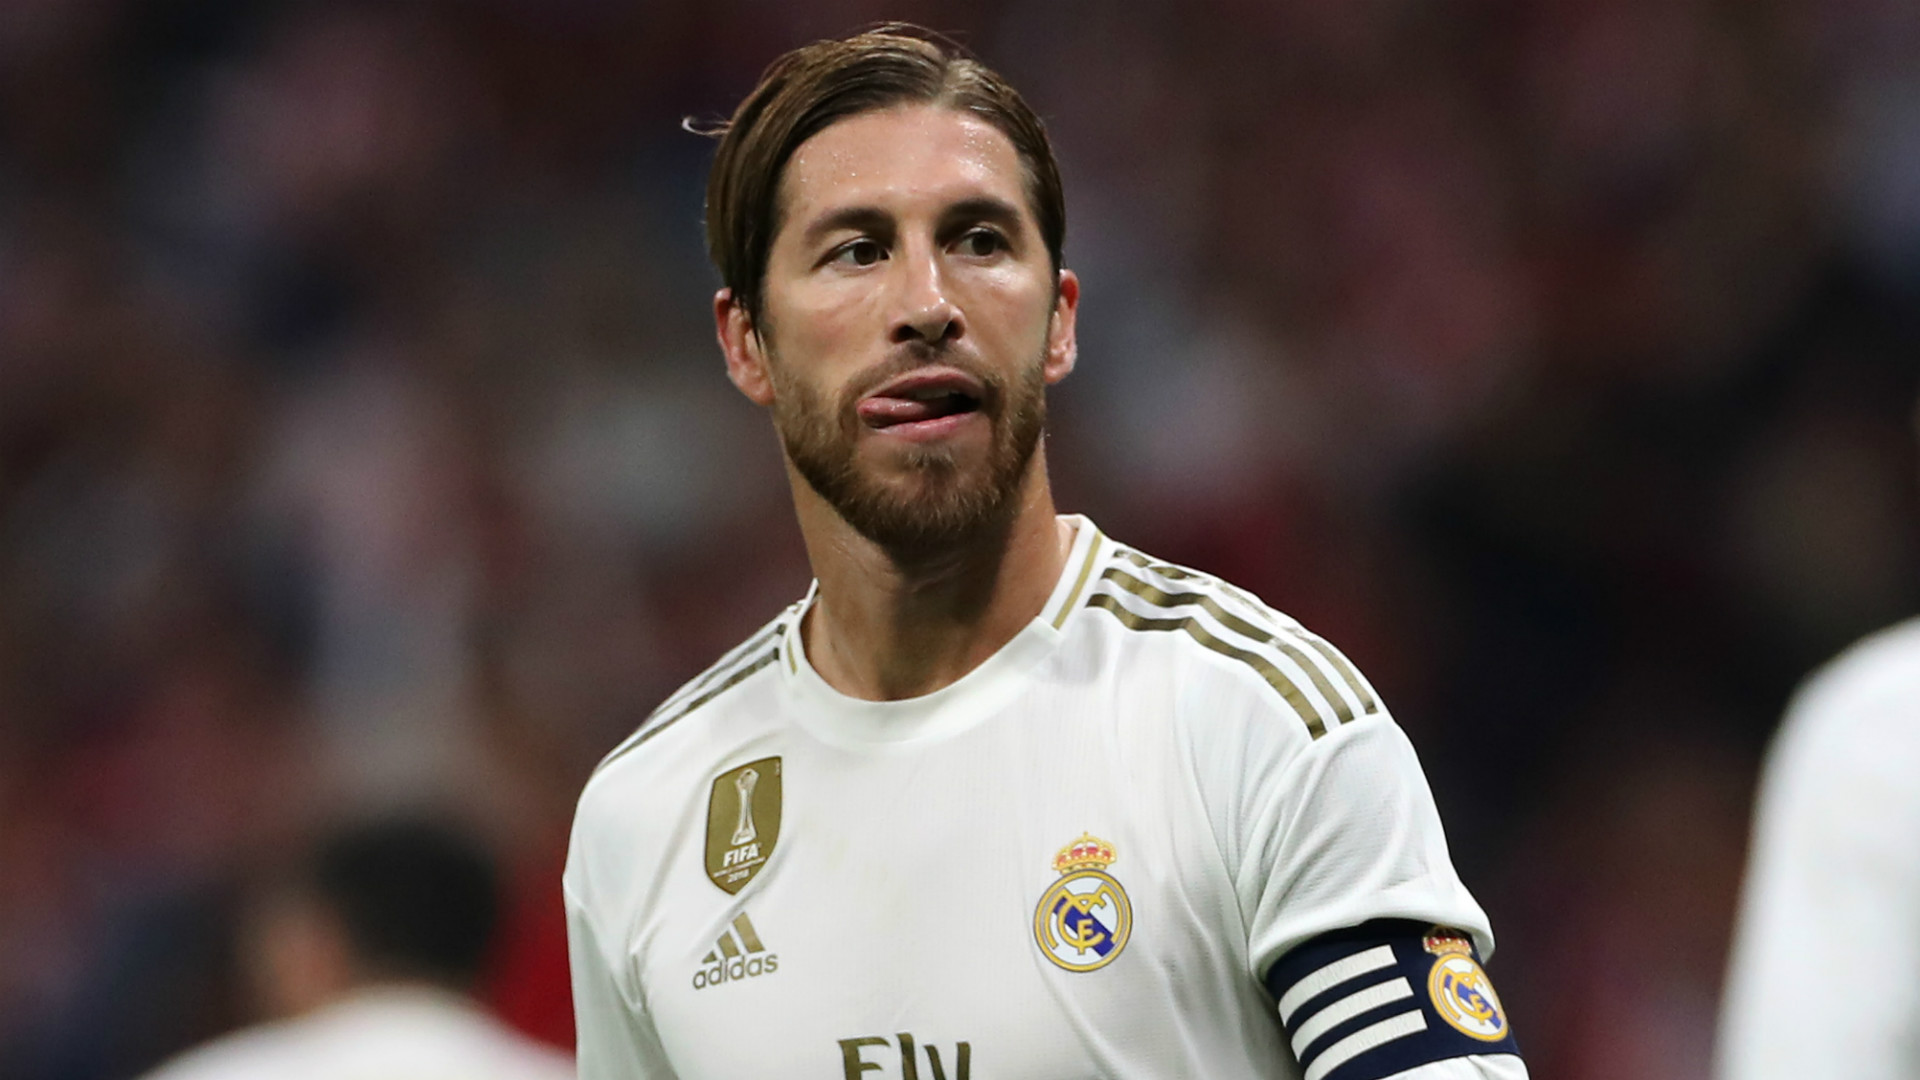 Real Madrid Ramos